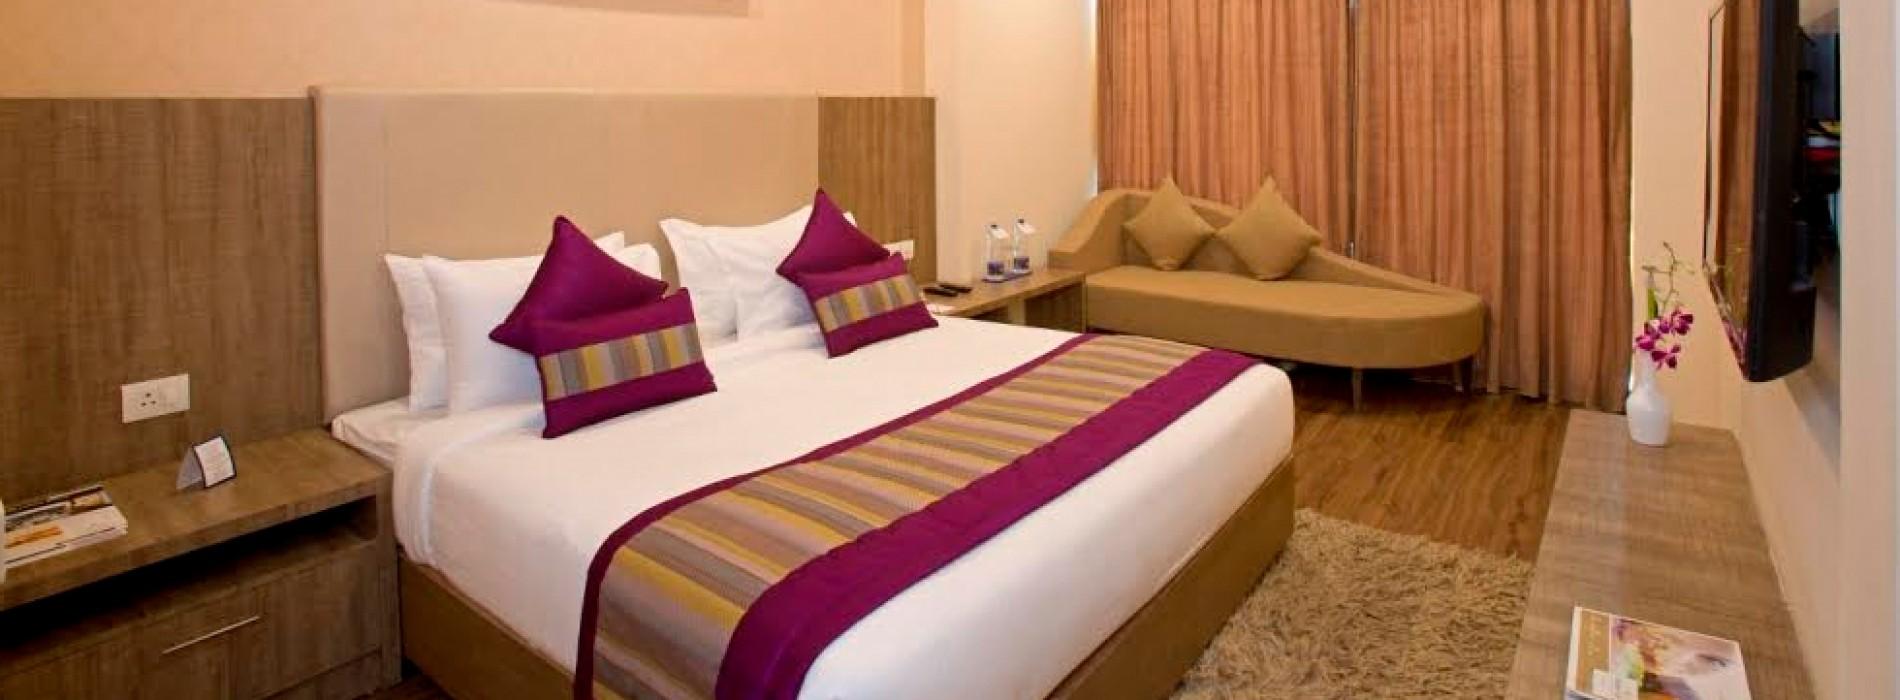 Golden Tulip Suites Gurgaon to open its doors in the corporate hub of Gurgaon